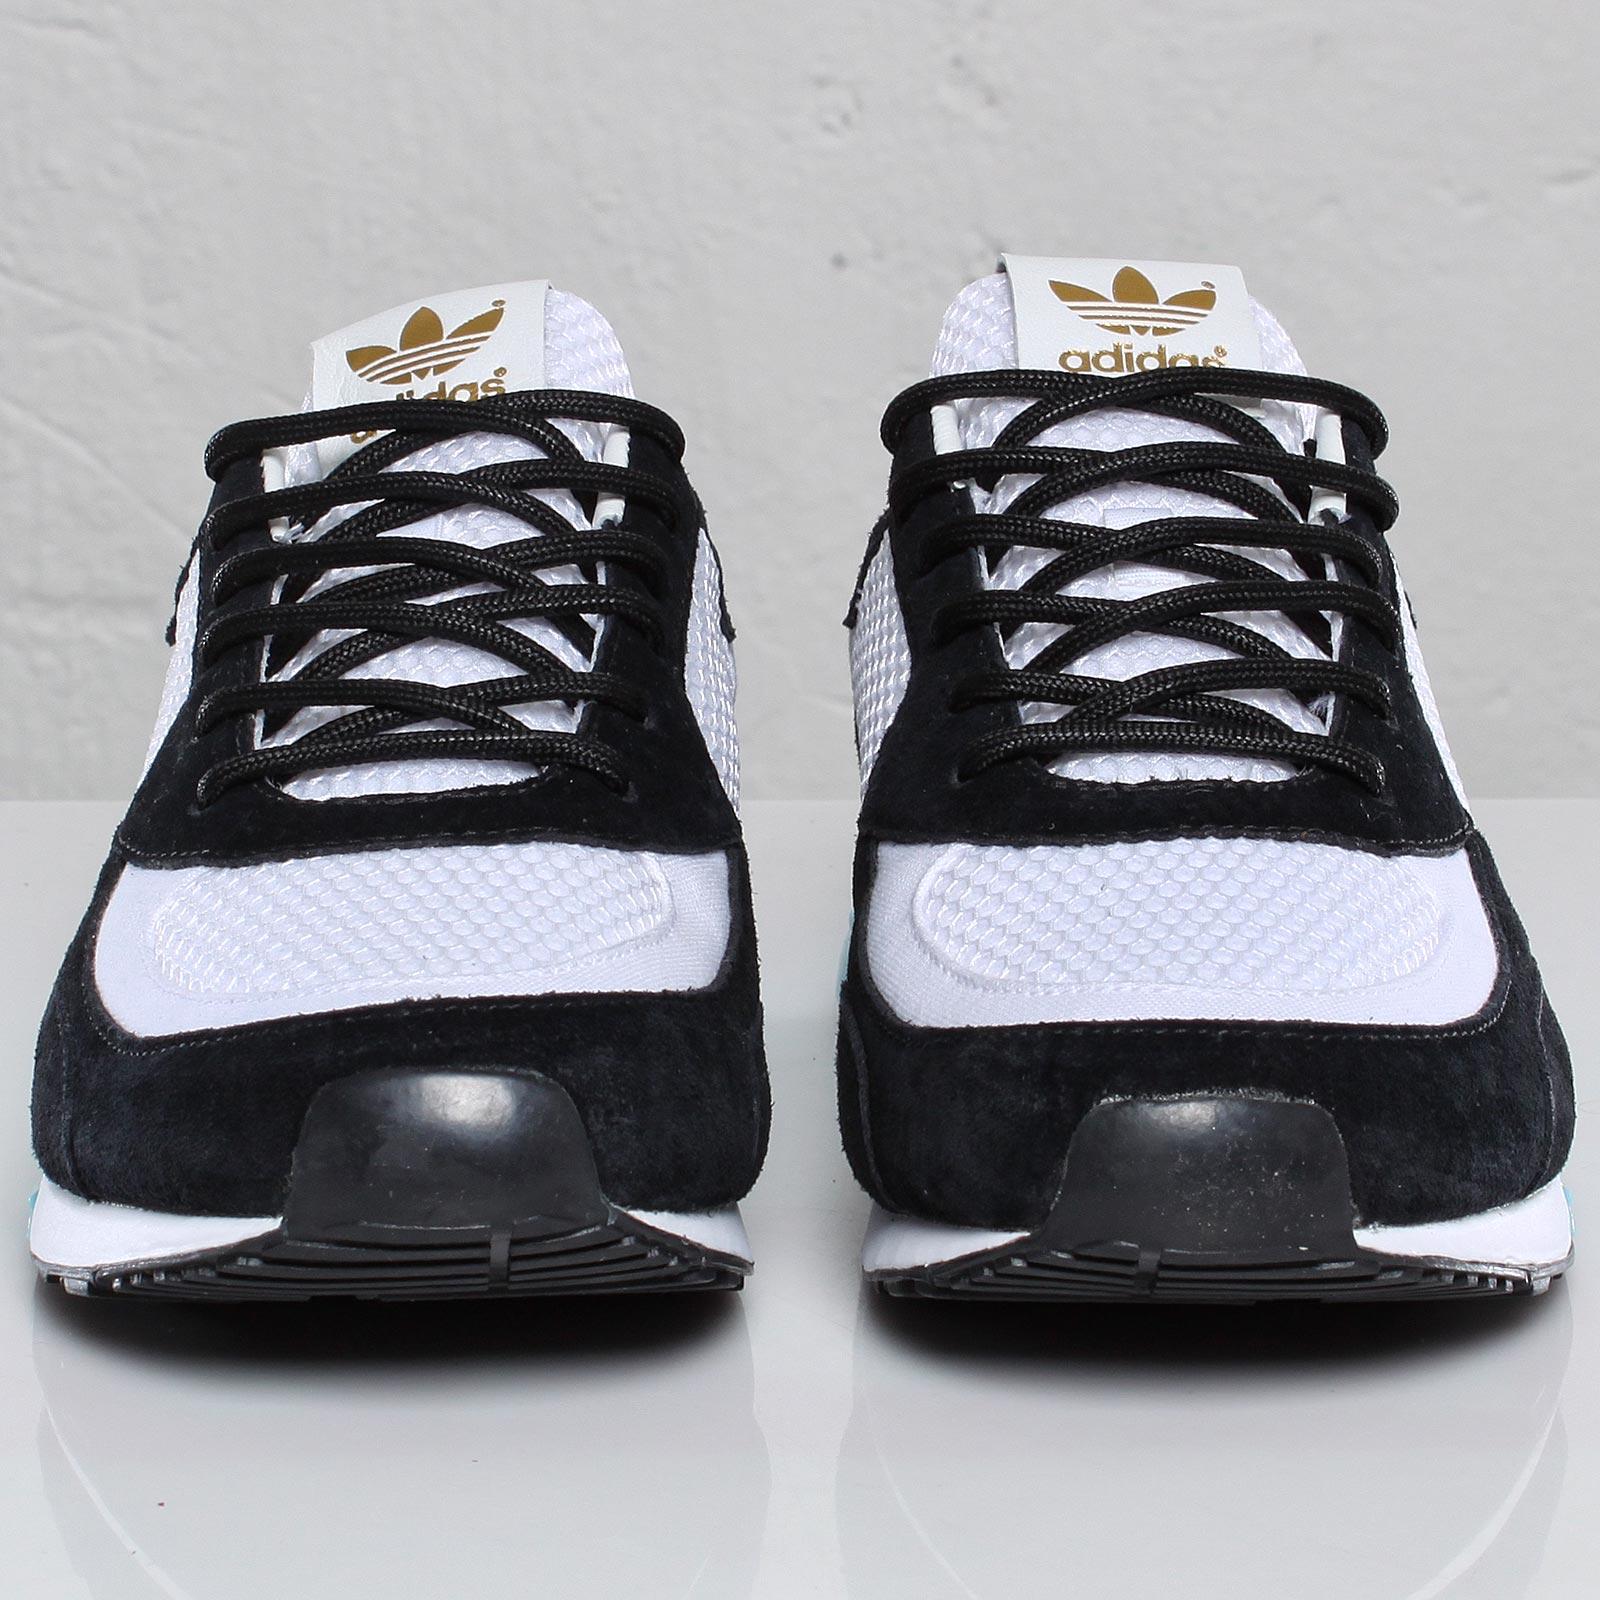 6decbebfecc adidas ZX 800 DB - 101906 - Sneakersnstuff